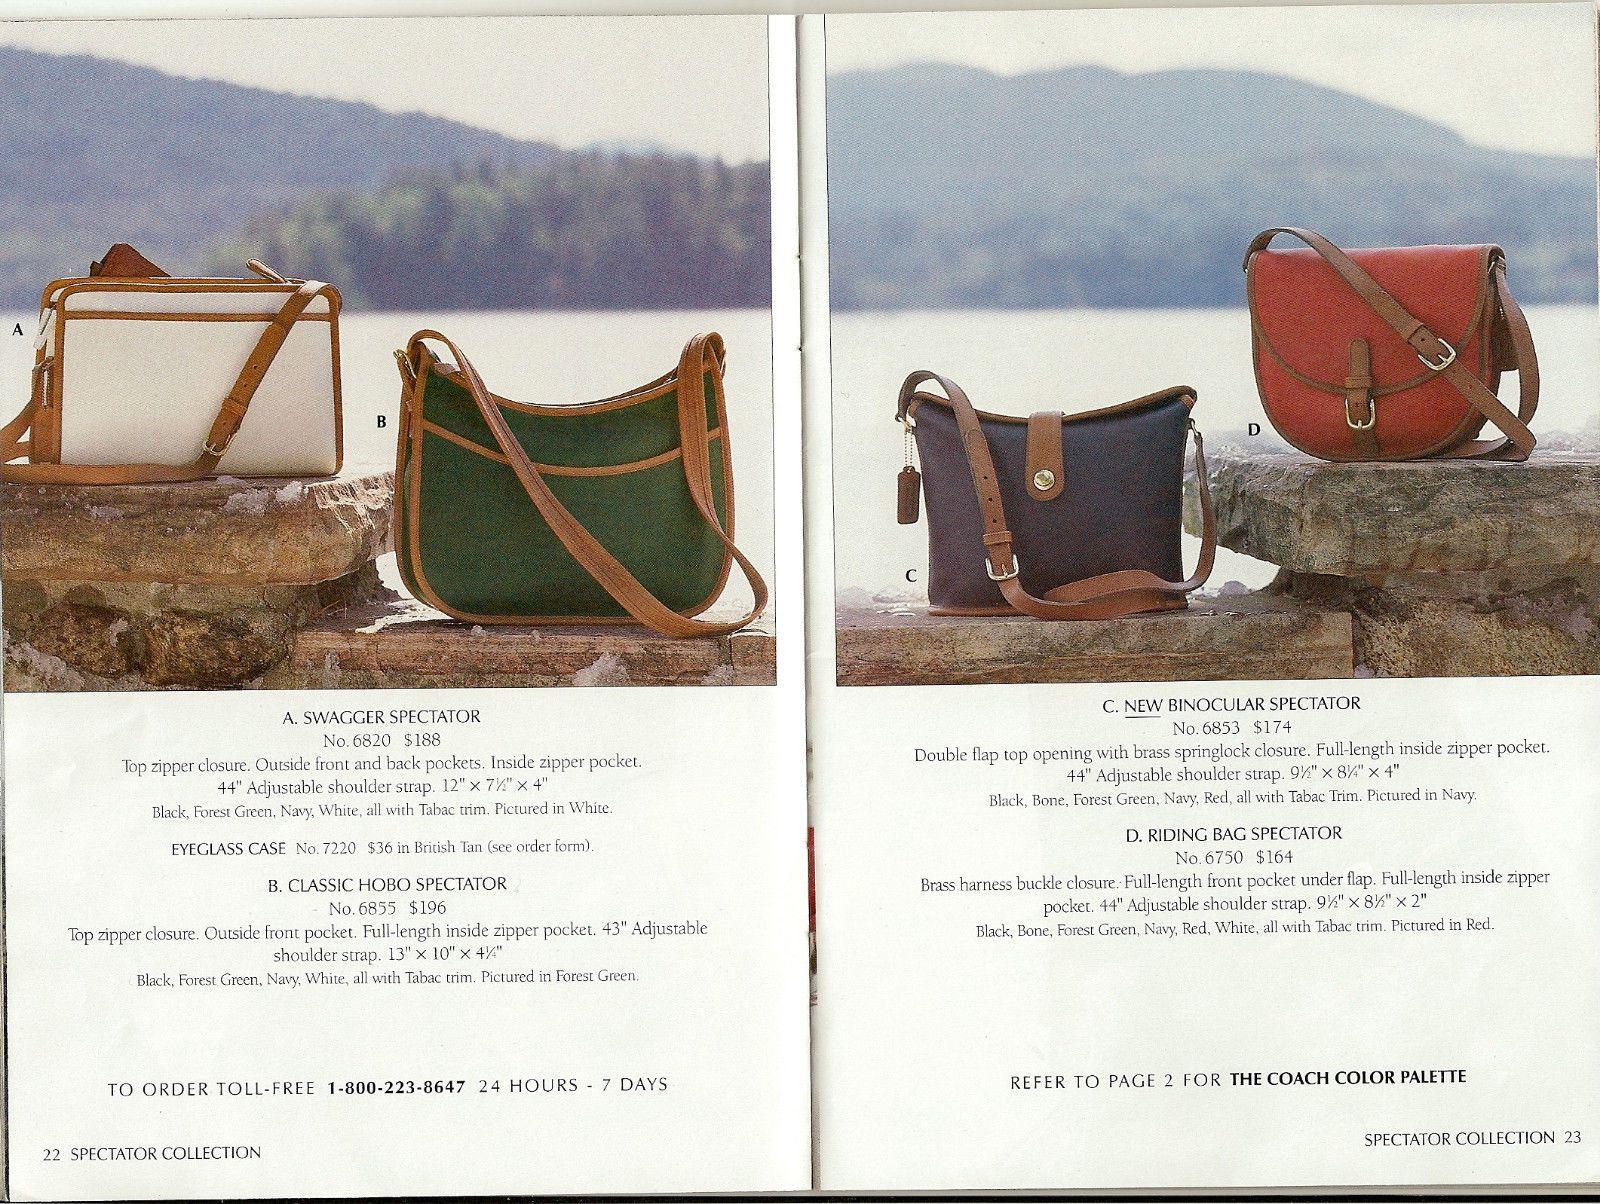 c191ad366c Vintage Coach Bag Catalogs 1981 2002 Scanned to 4GB Bracelet USB Thumb  Drive